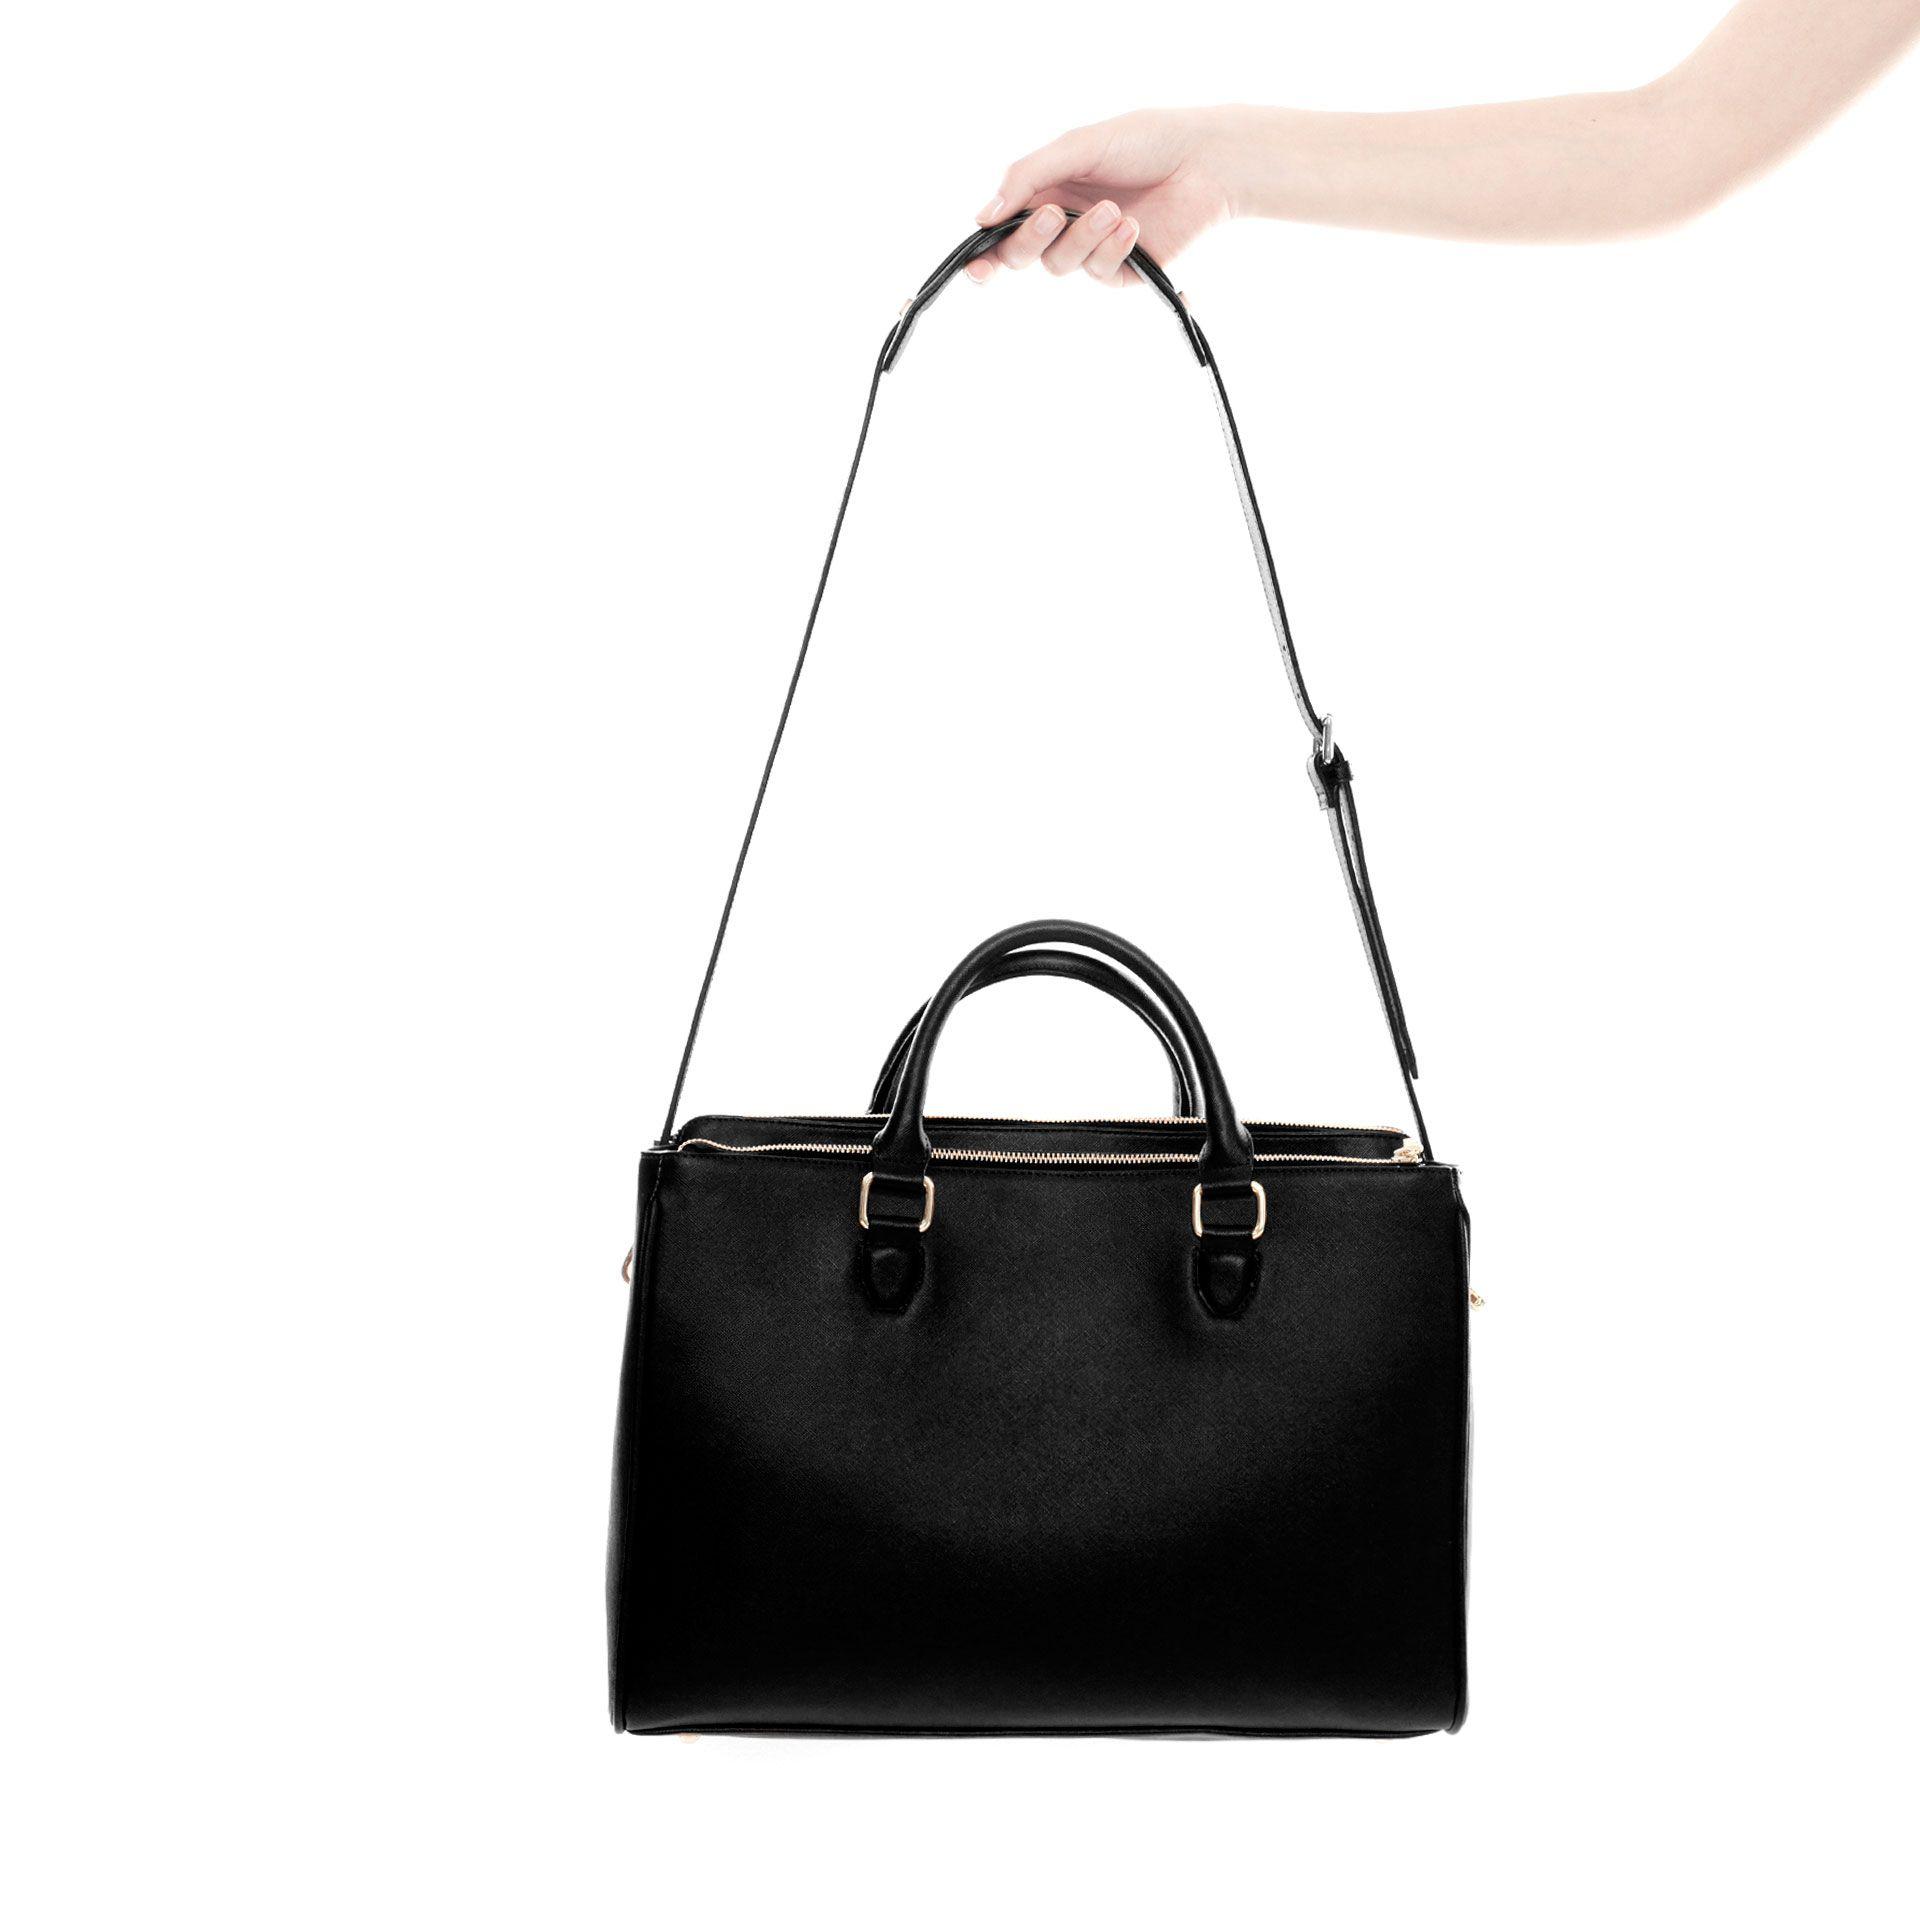 OFFICE CITY BAG - Handbags - Woman - ZARA Canada | Want ...